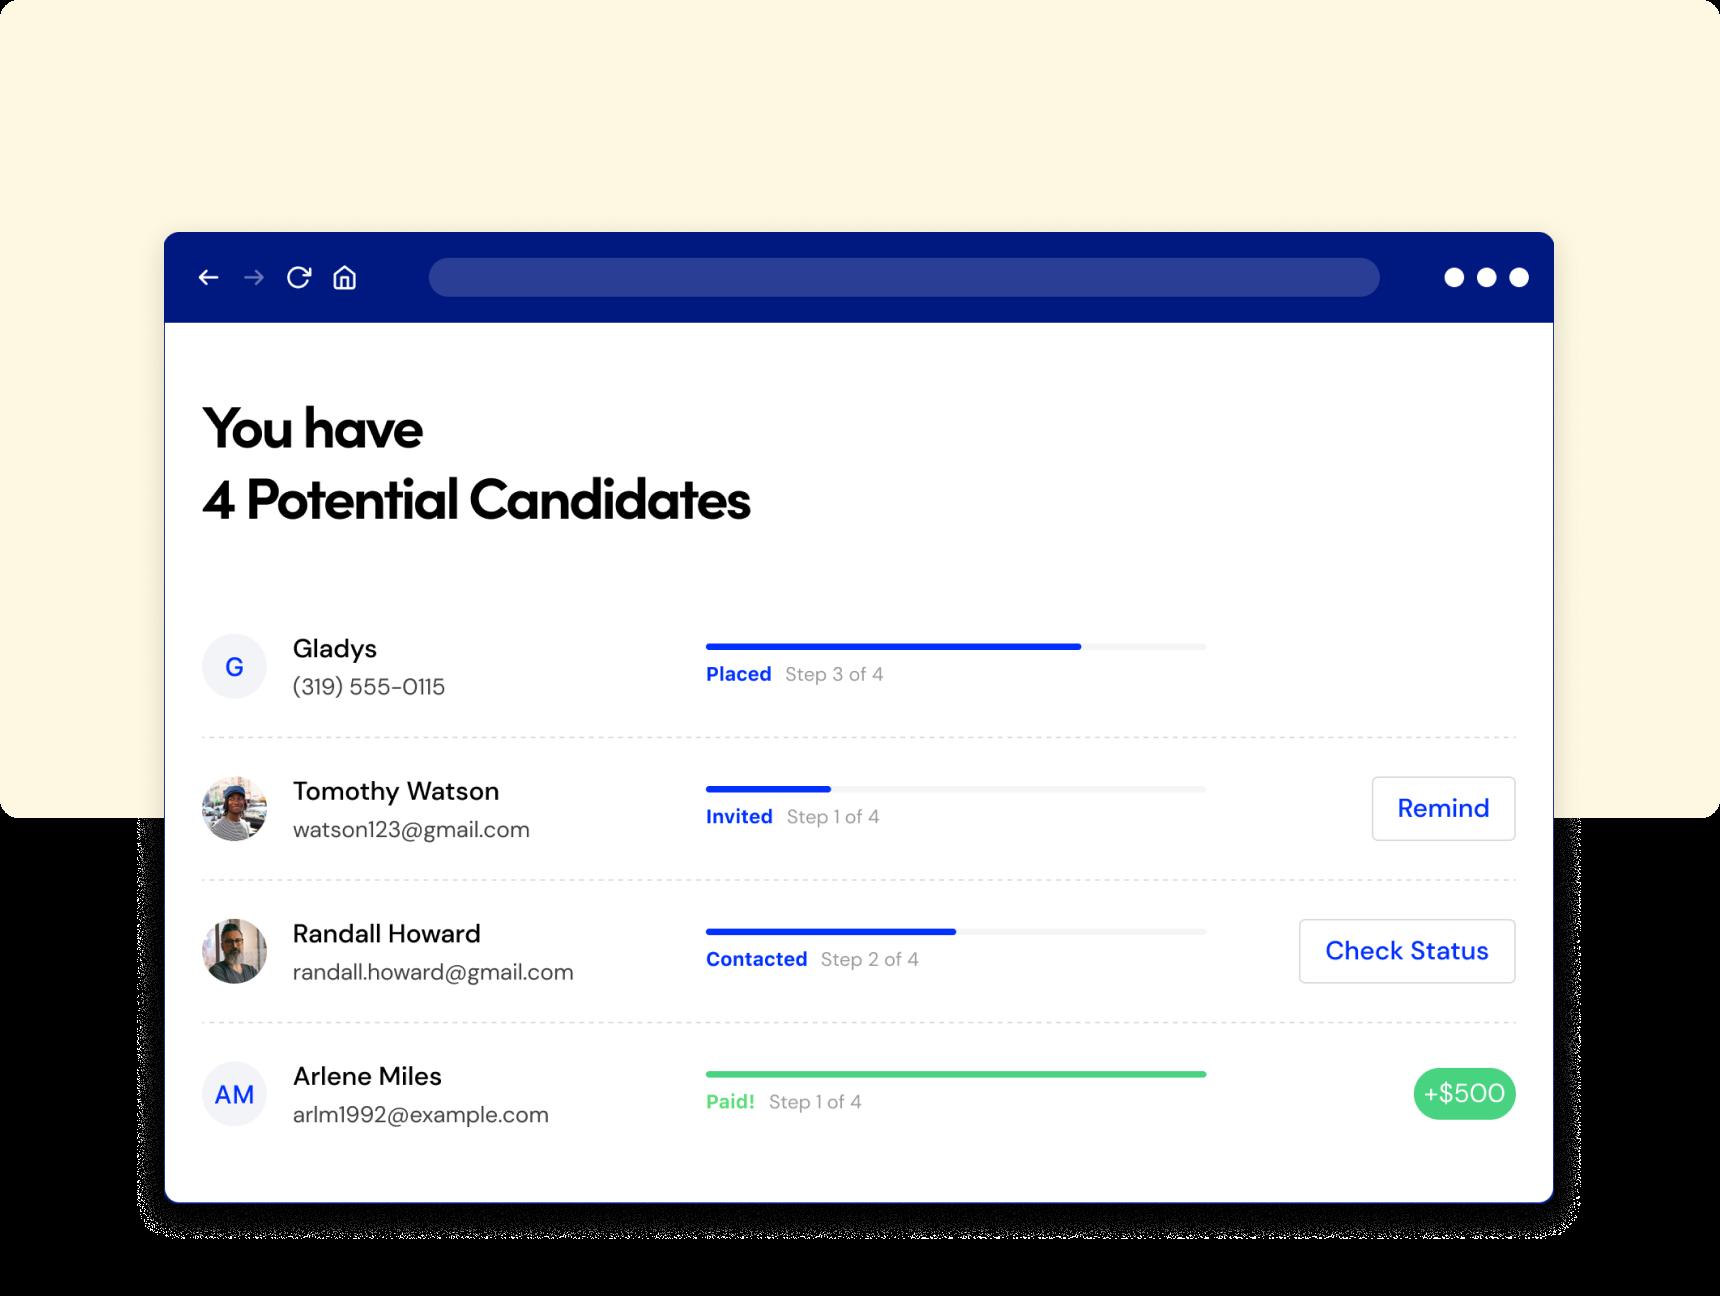 Arrangement-Candidates